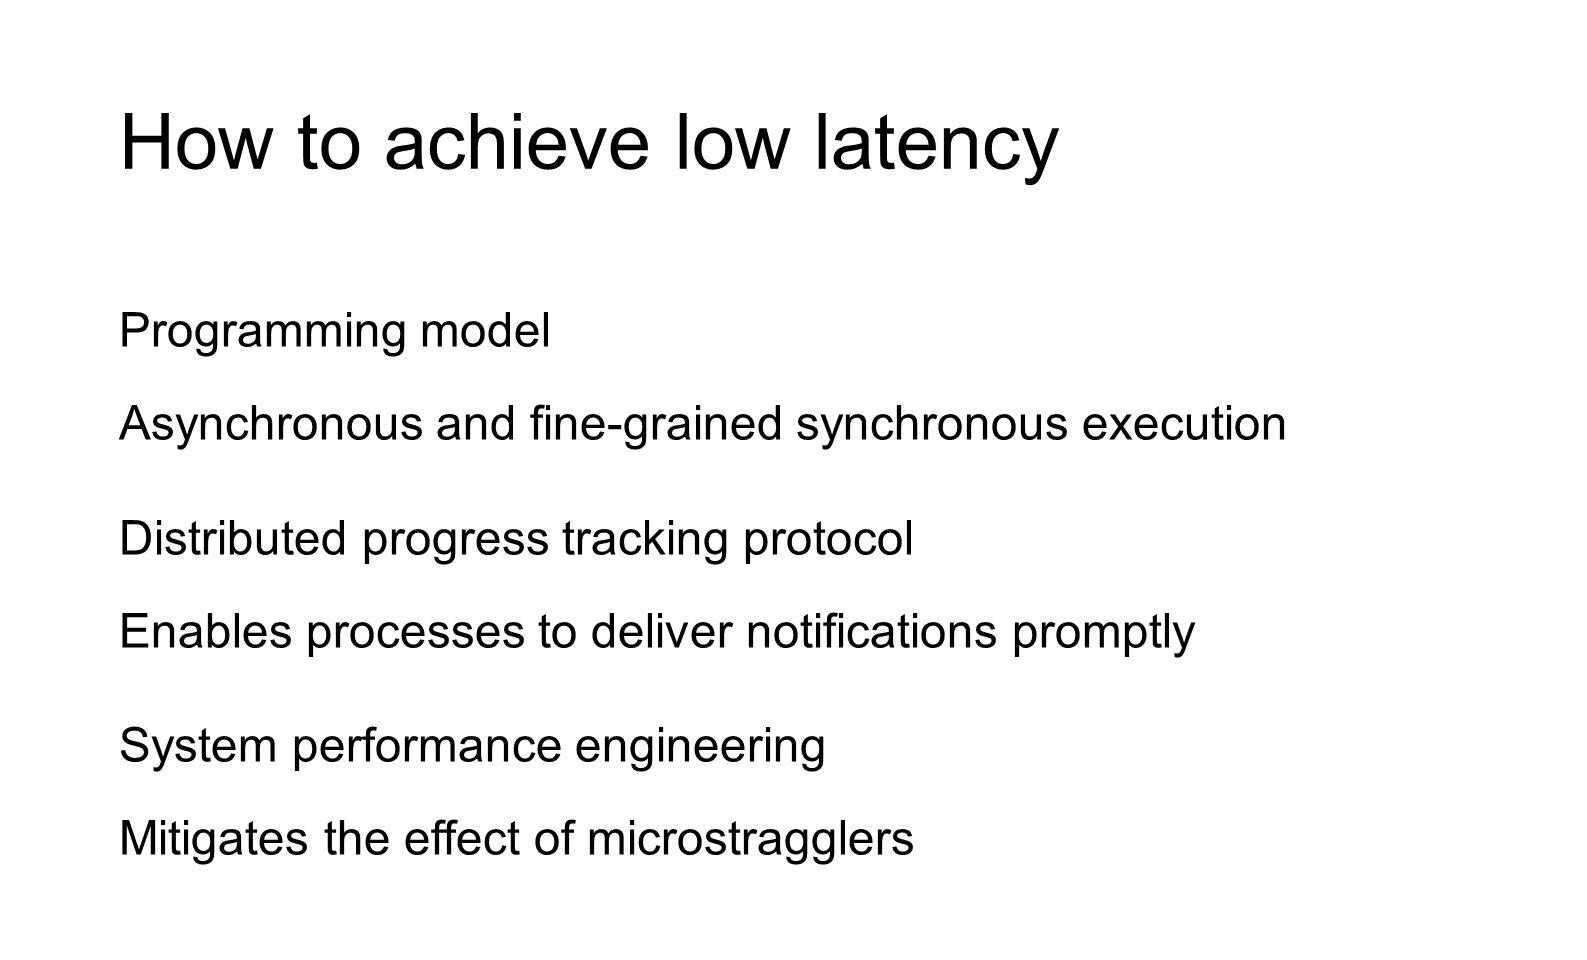 How to achieve low latency